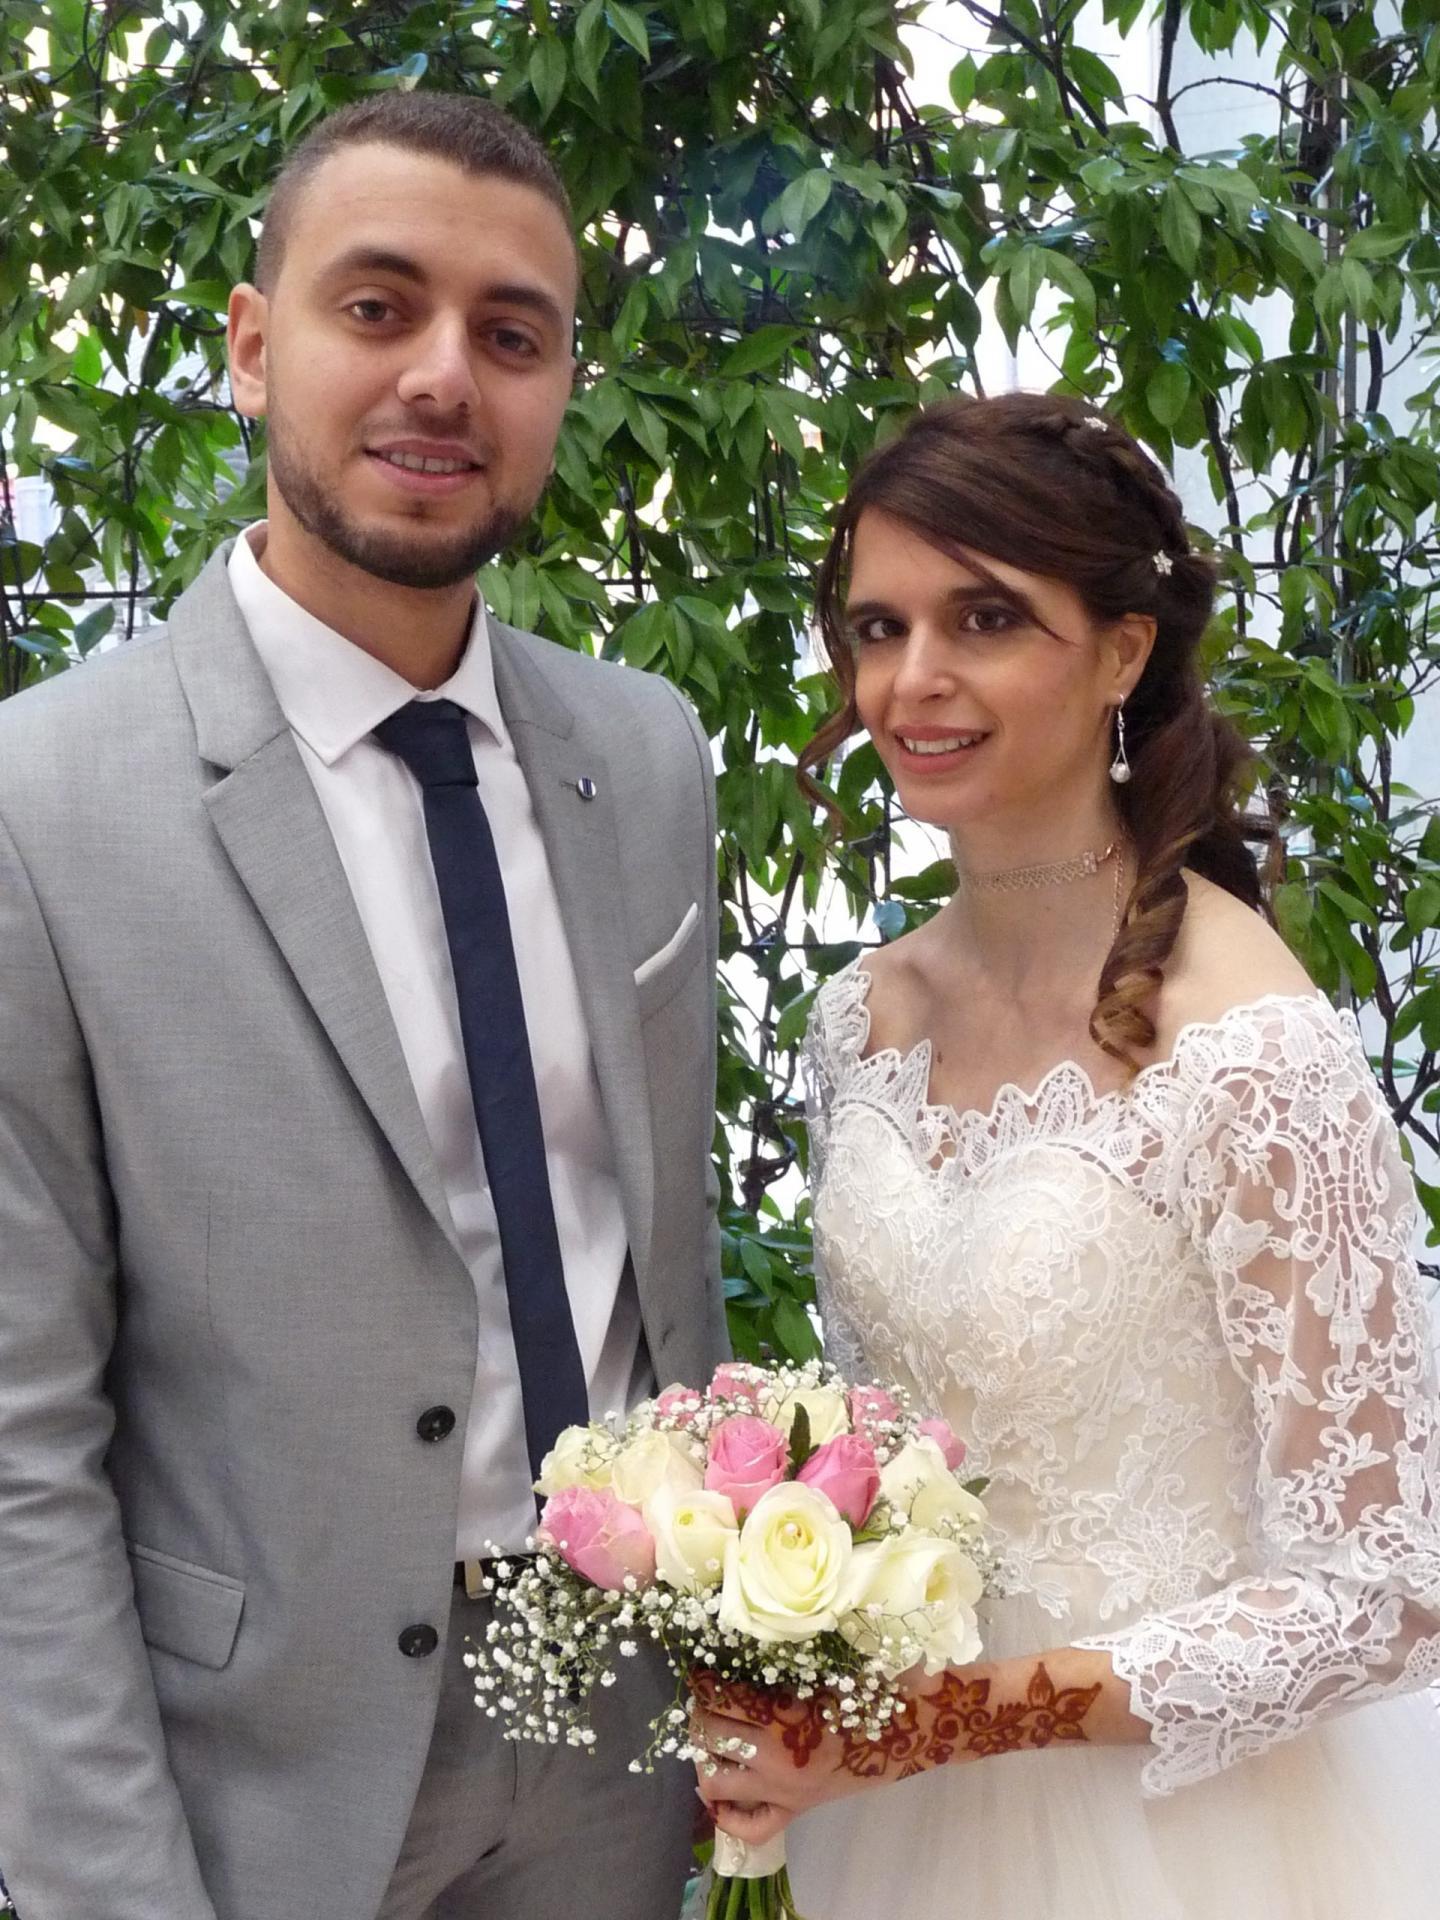 Aimad Mninouch, étudiant, et Brenda Bernardi, agent de gestion.